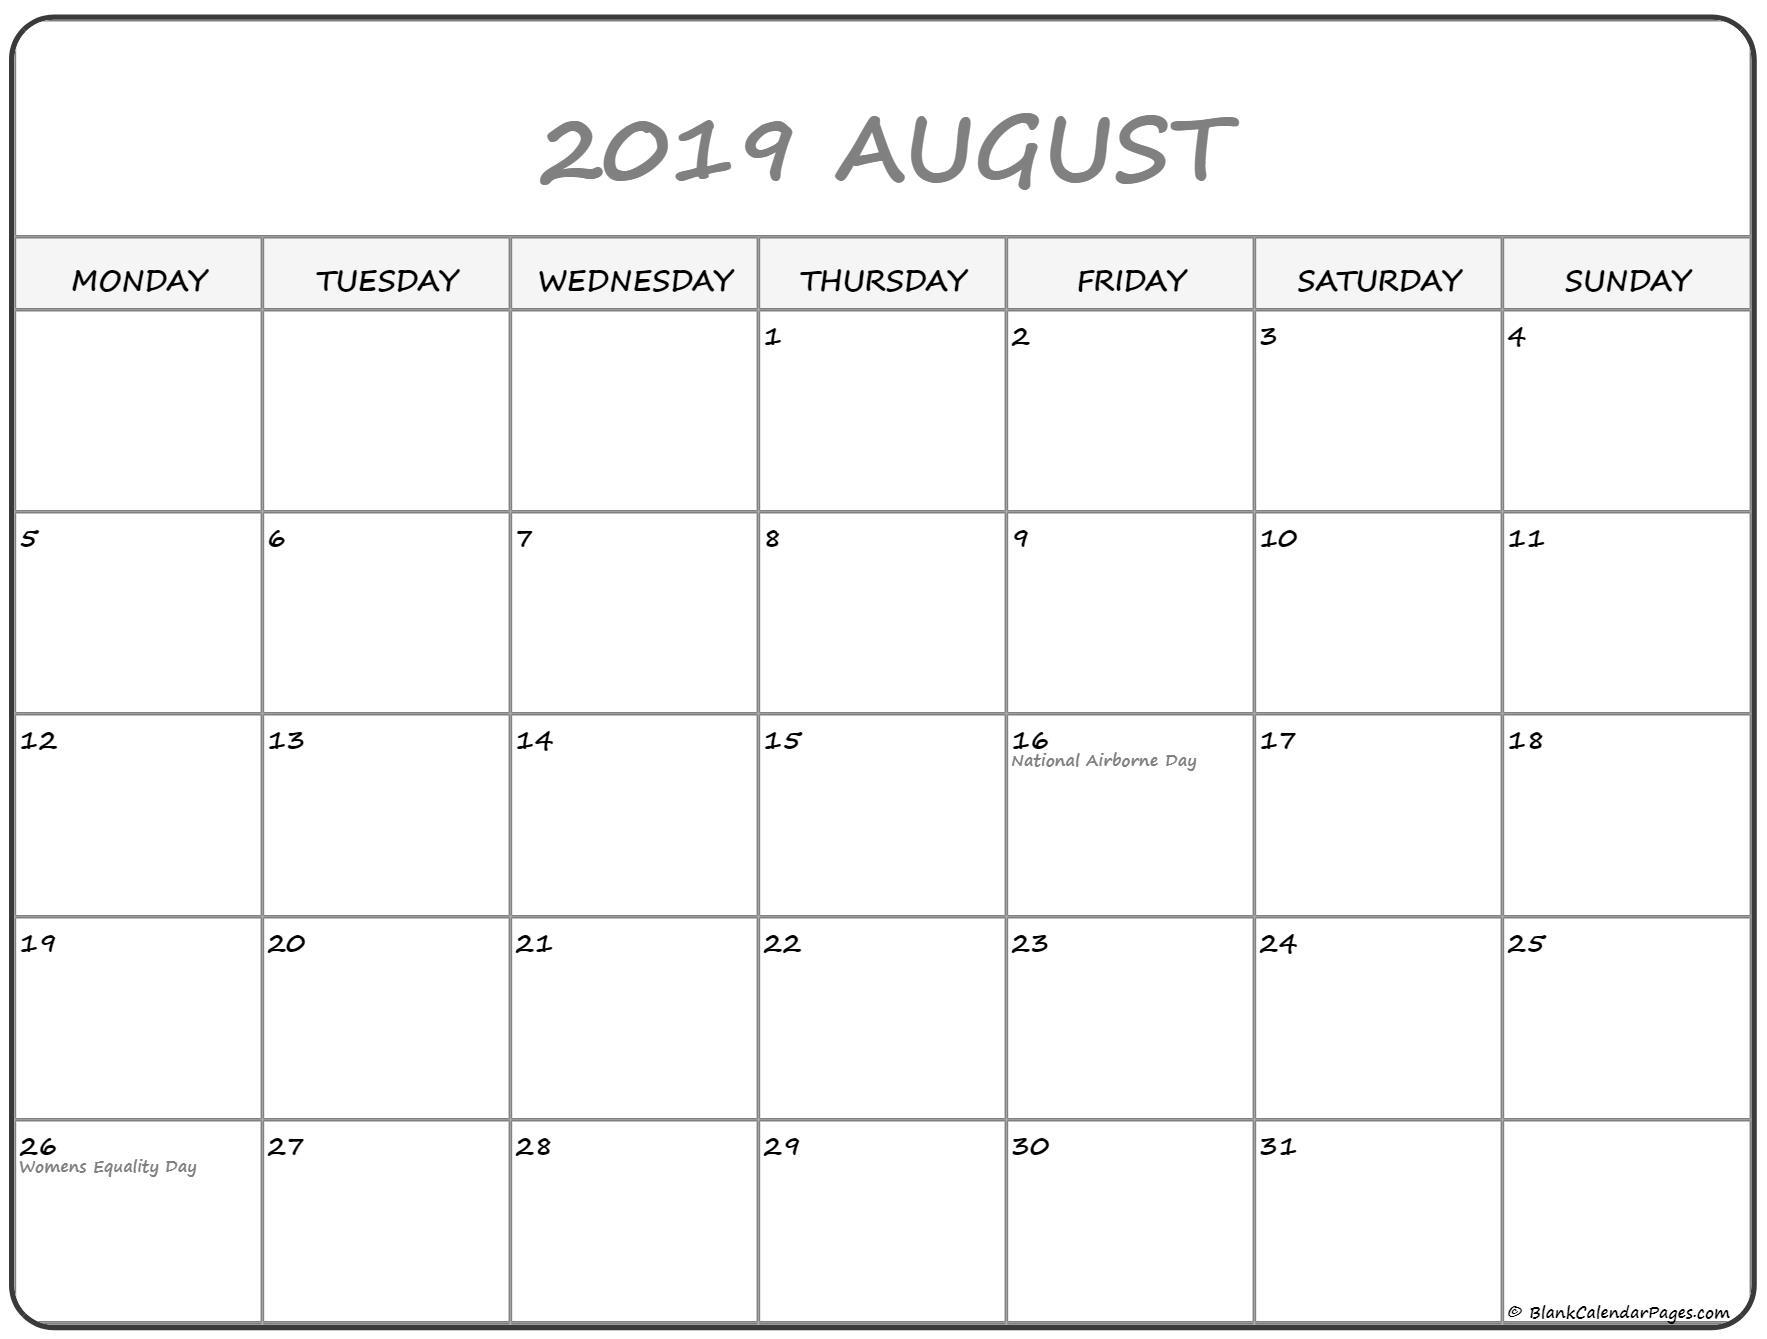 August 2019 Monday Calendar | Monday To Sunday